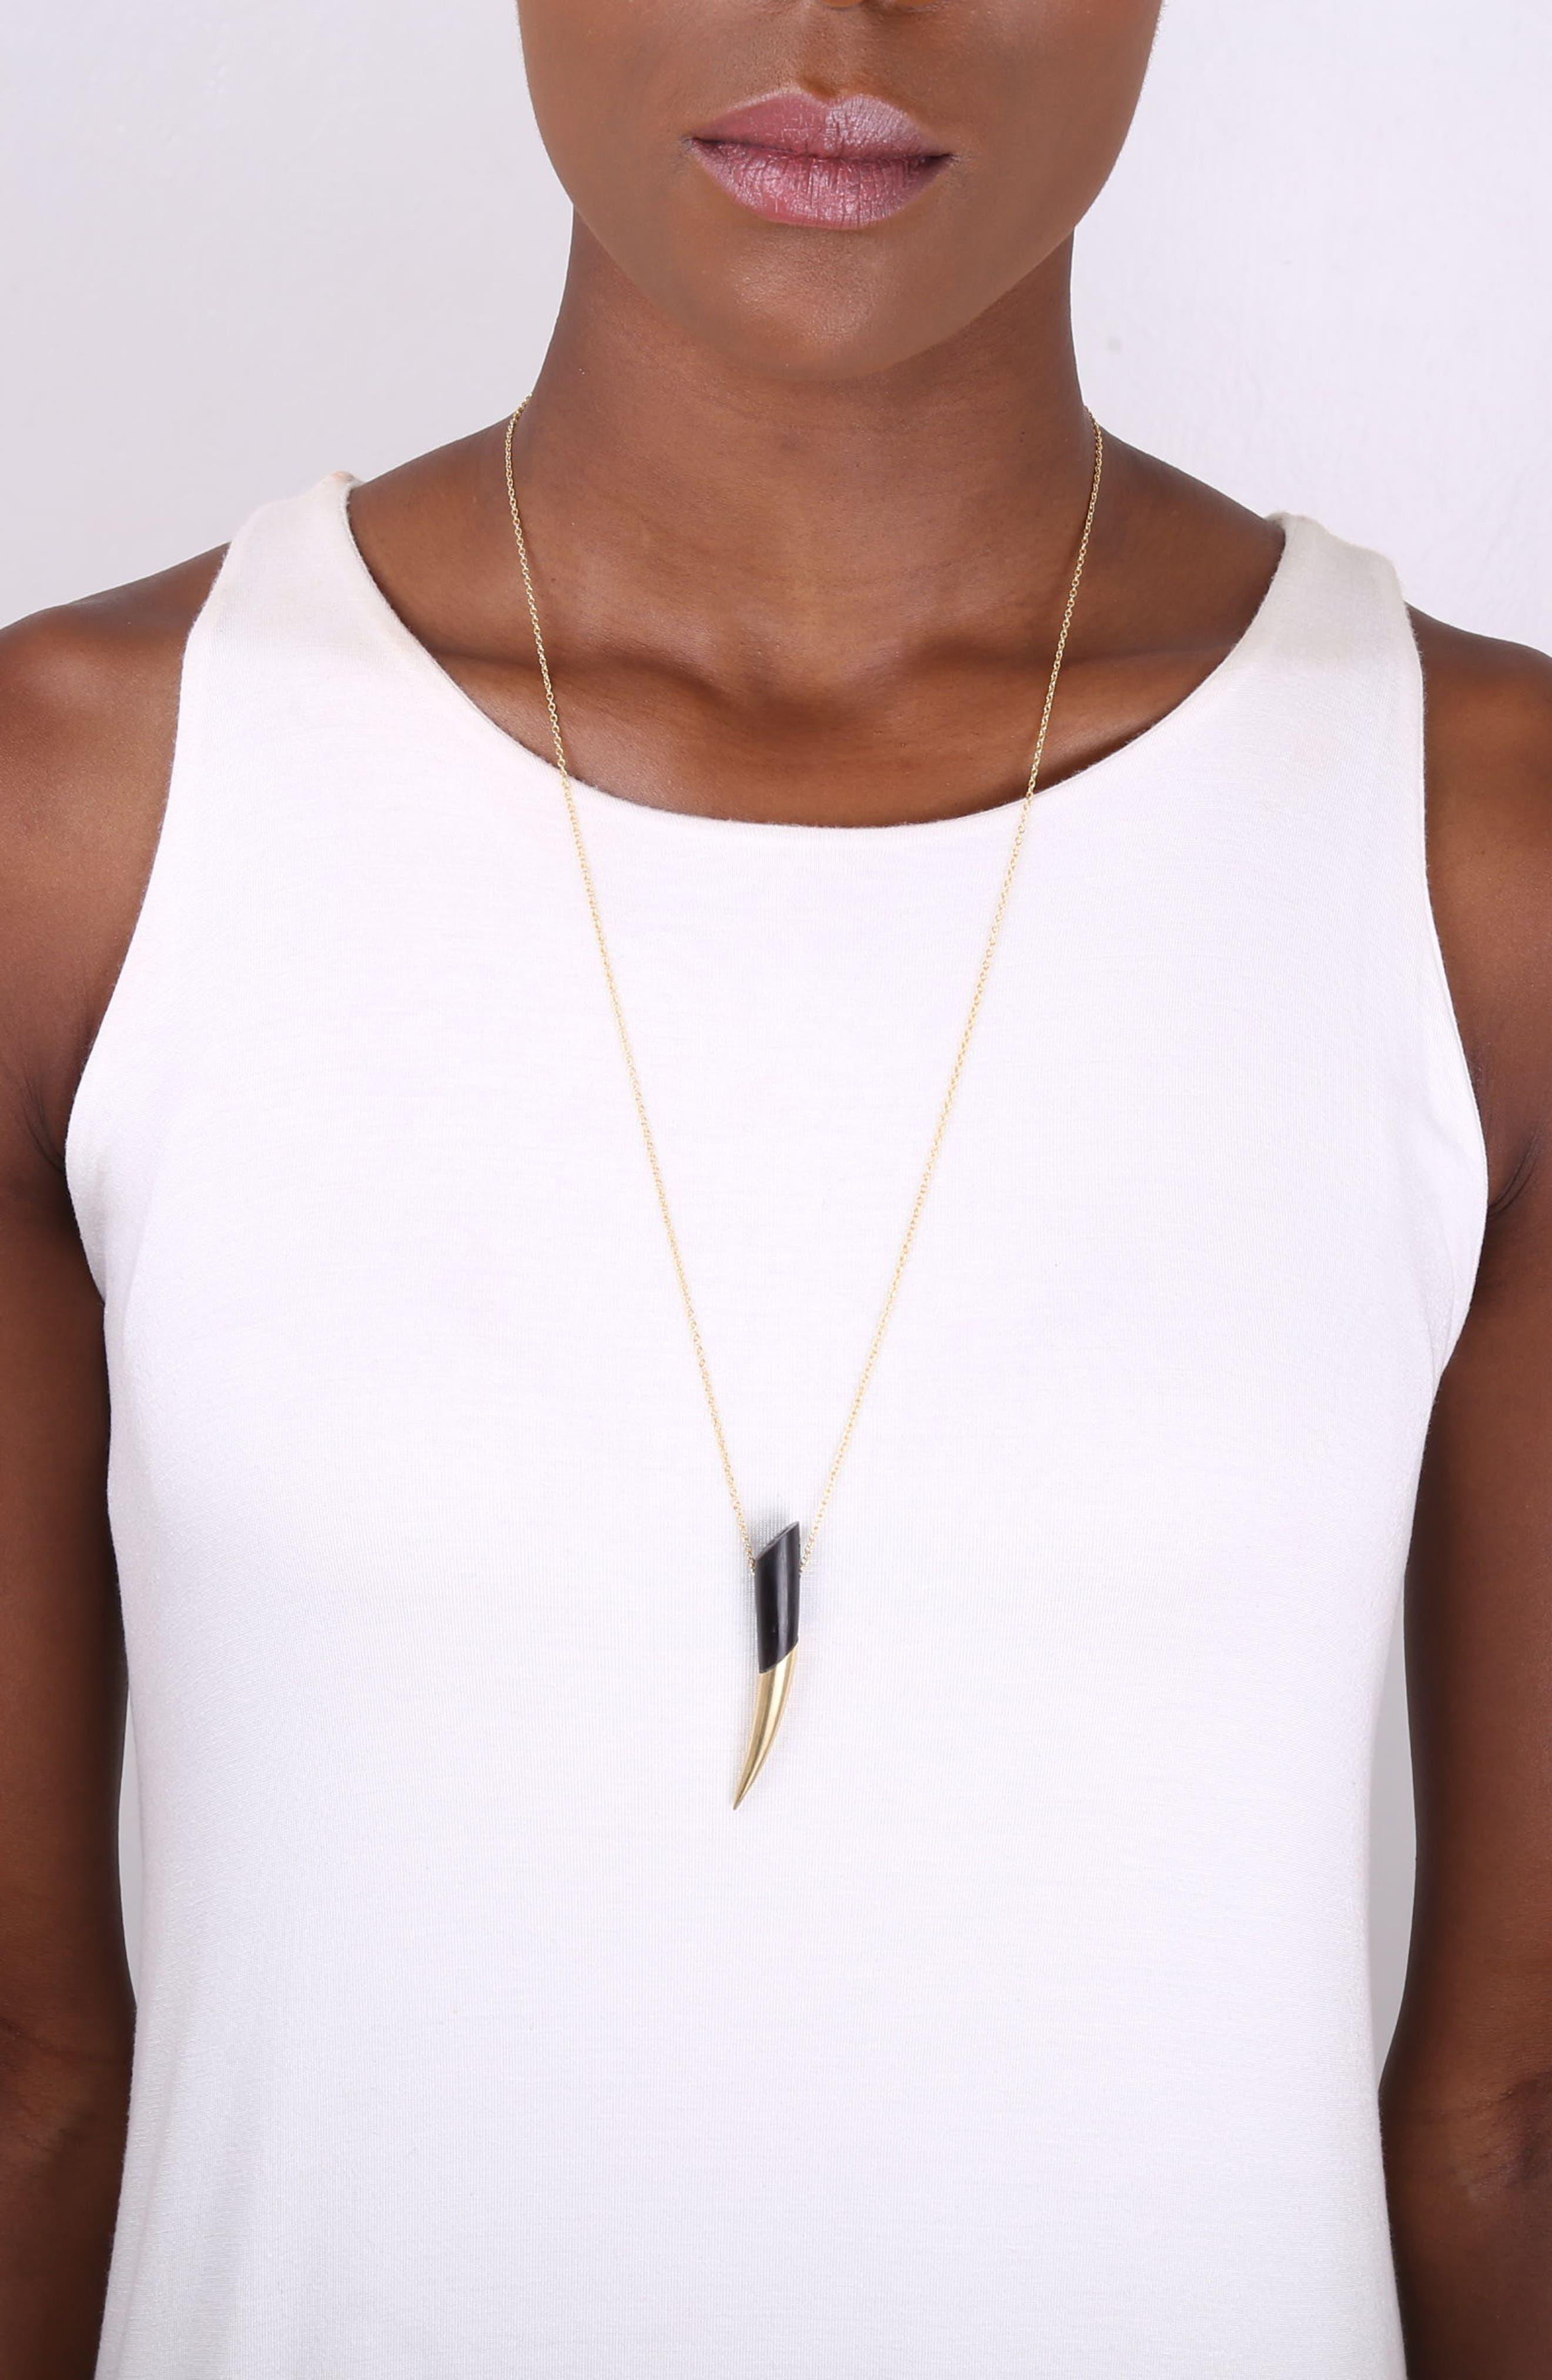 Dalili Horn Pendant Necklace,                             Alternate thumbnail 3, color,                             005